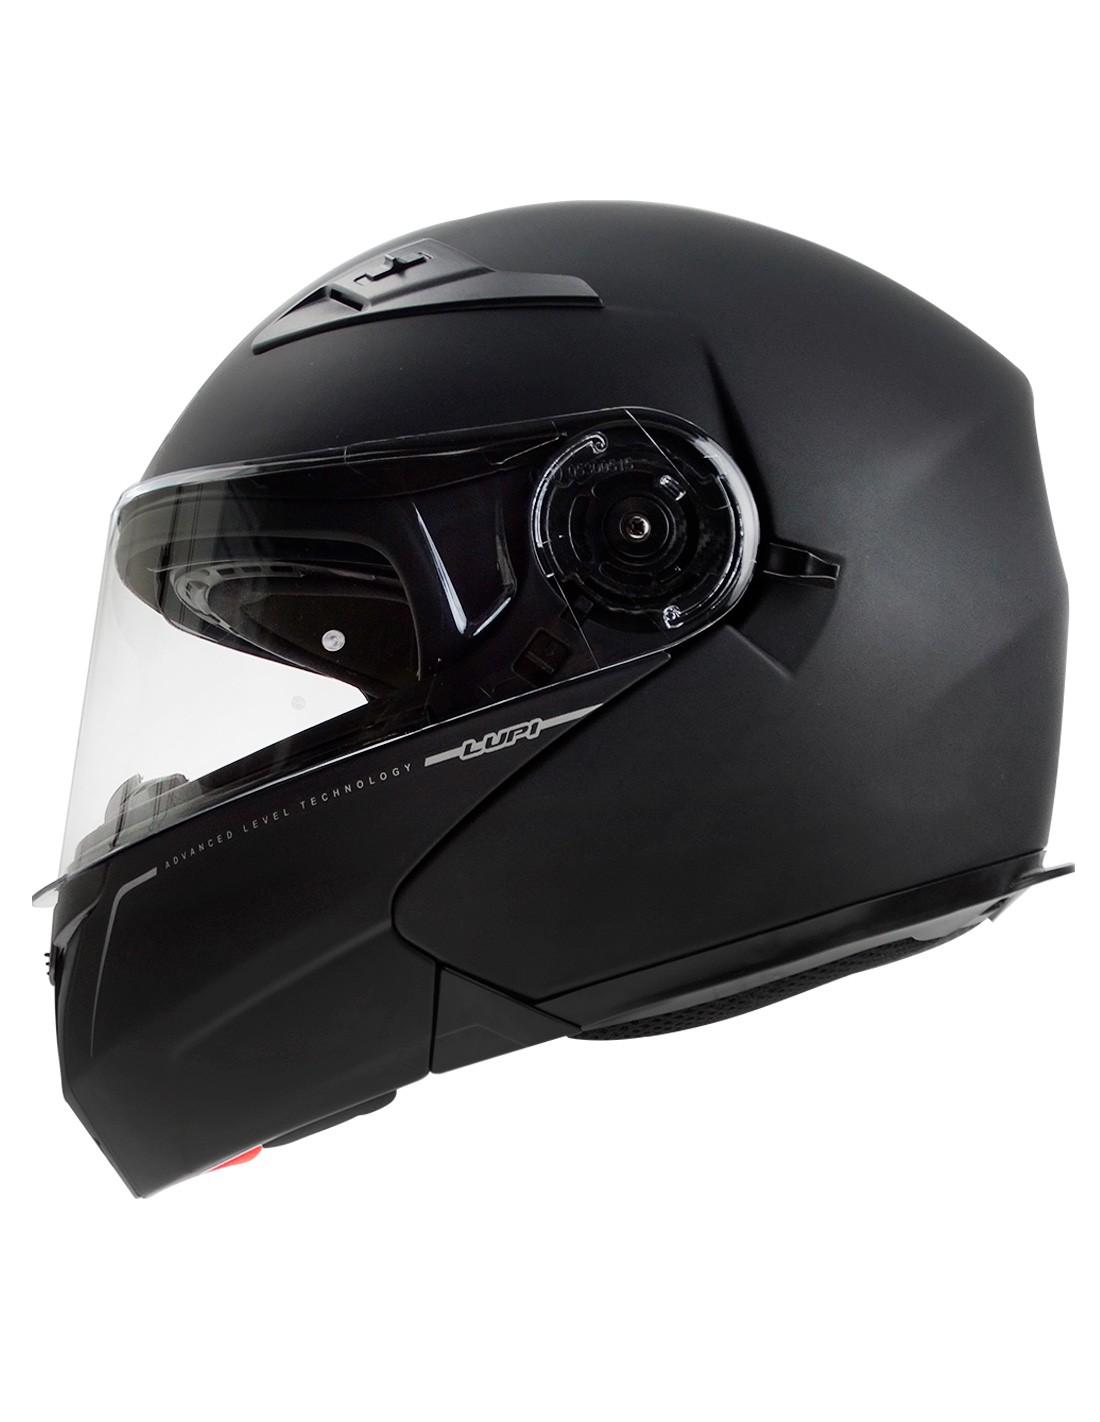 Moto En Cordura Chaqueta Onboard Y Negra De Gris Rebel 5qawRxZvw